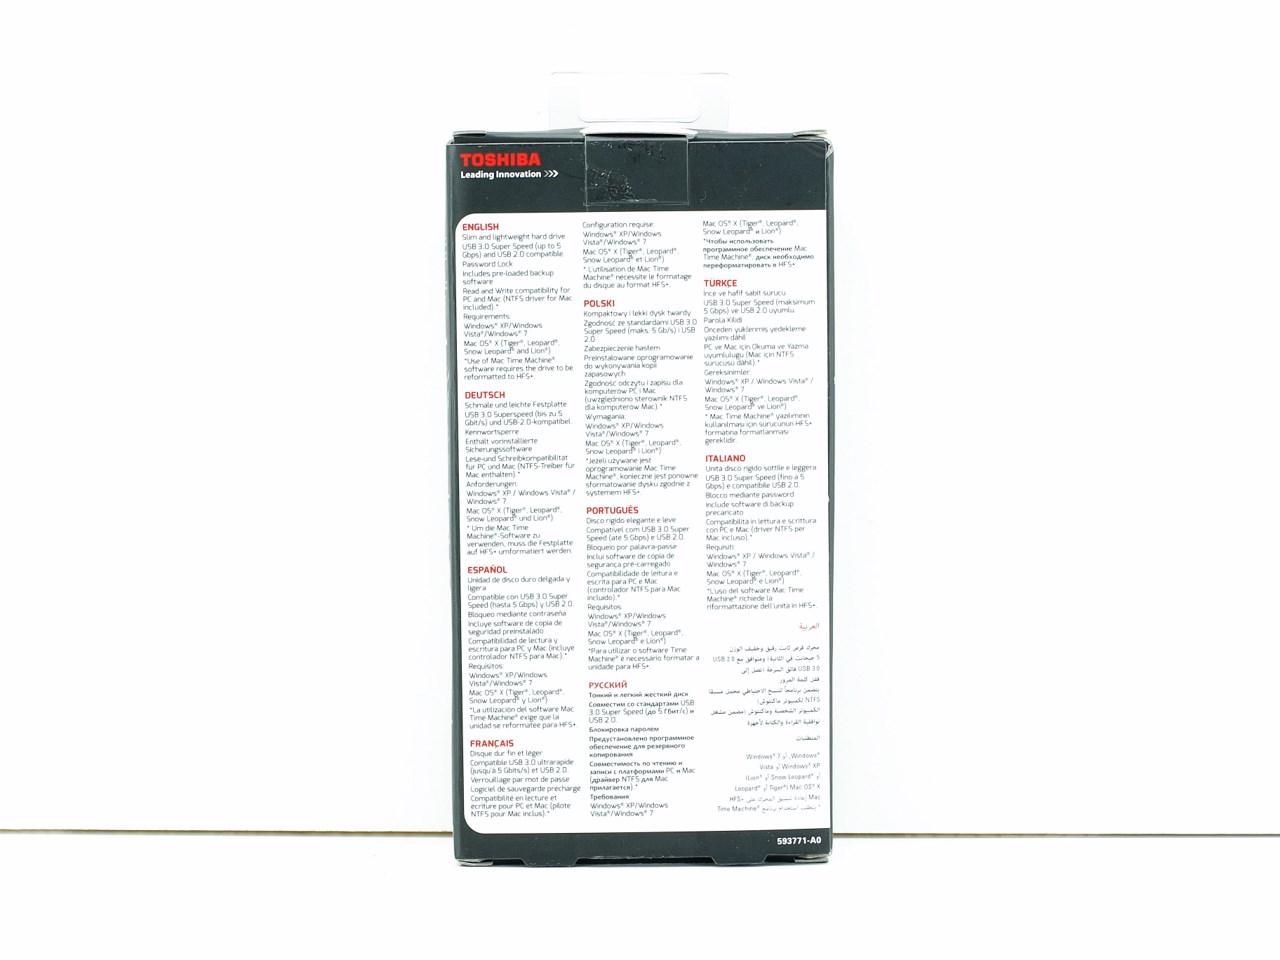 toshiba 500gb external hard drive manual